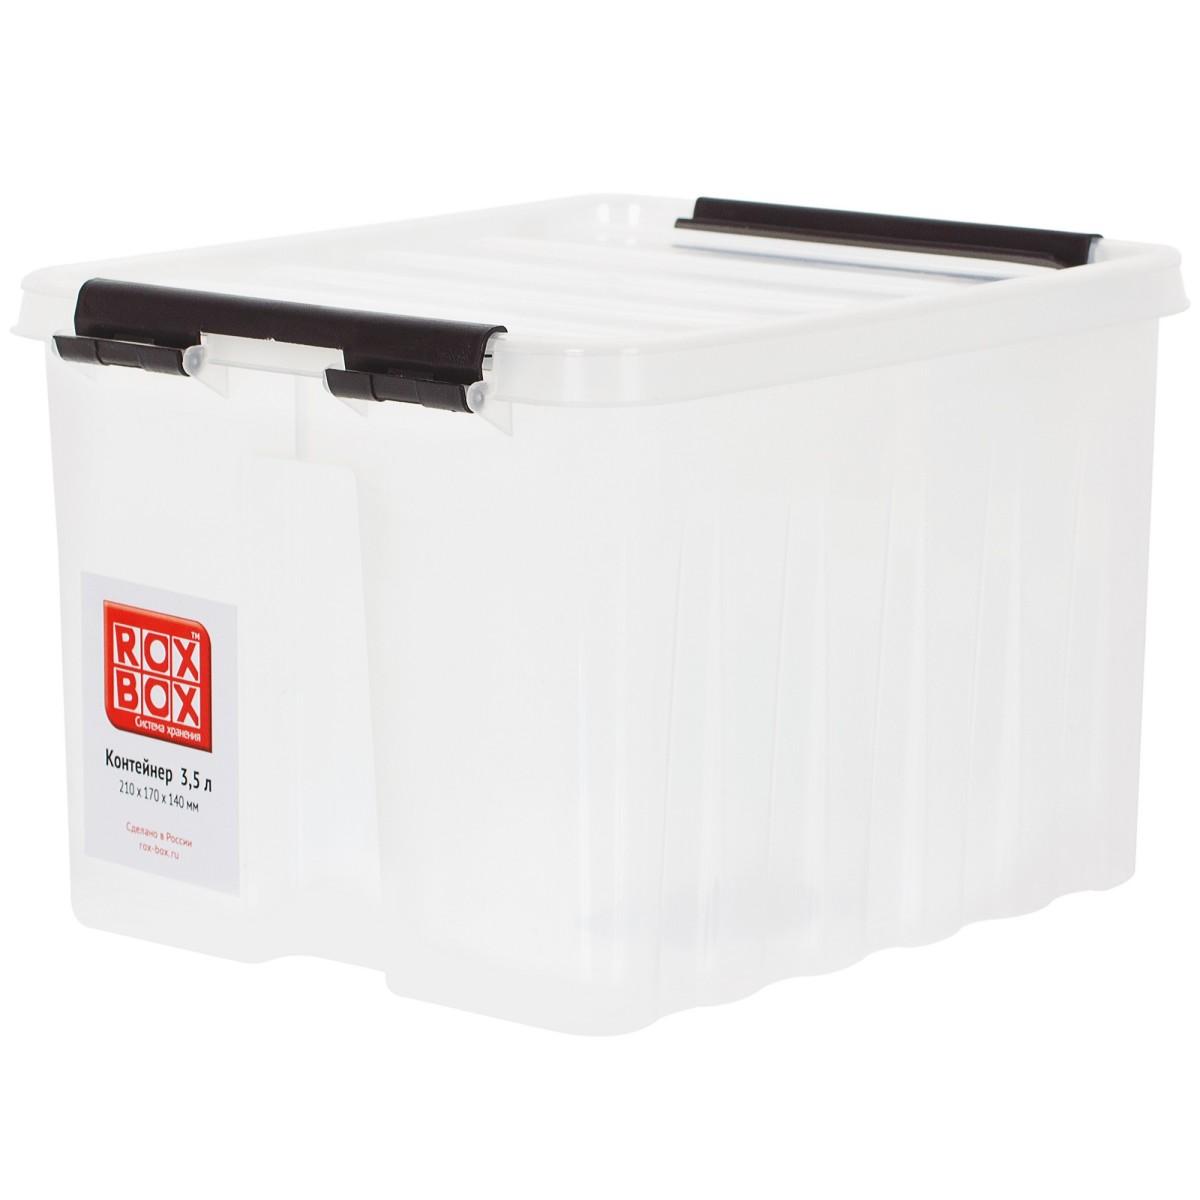 Контейнер Rox Box 17x14x21 см 3.5 л пластик цвет прозрачный с крышкой